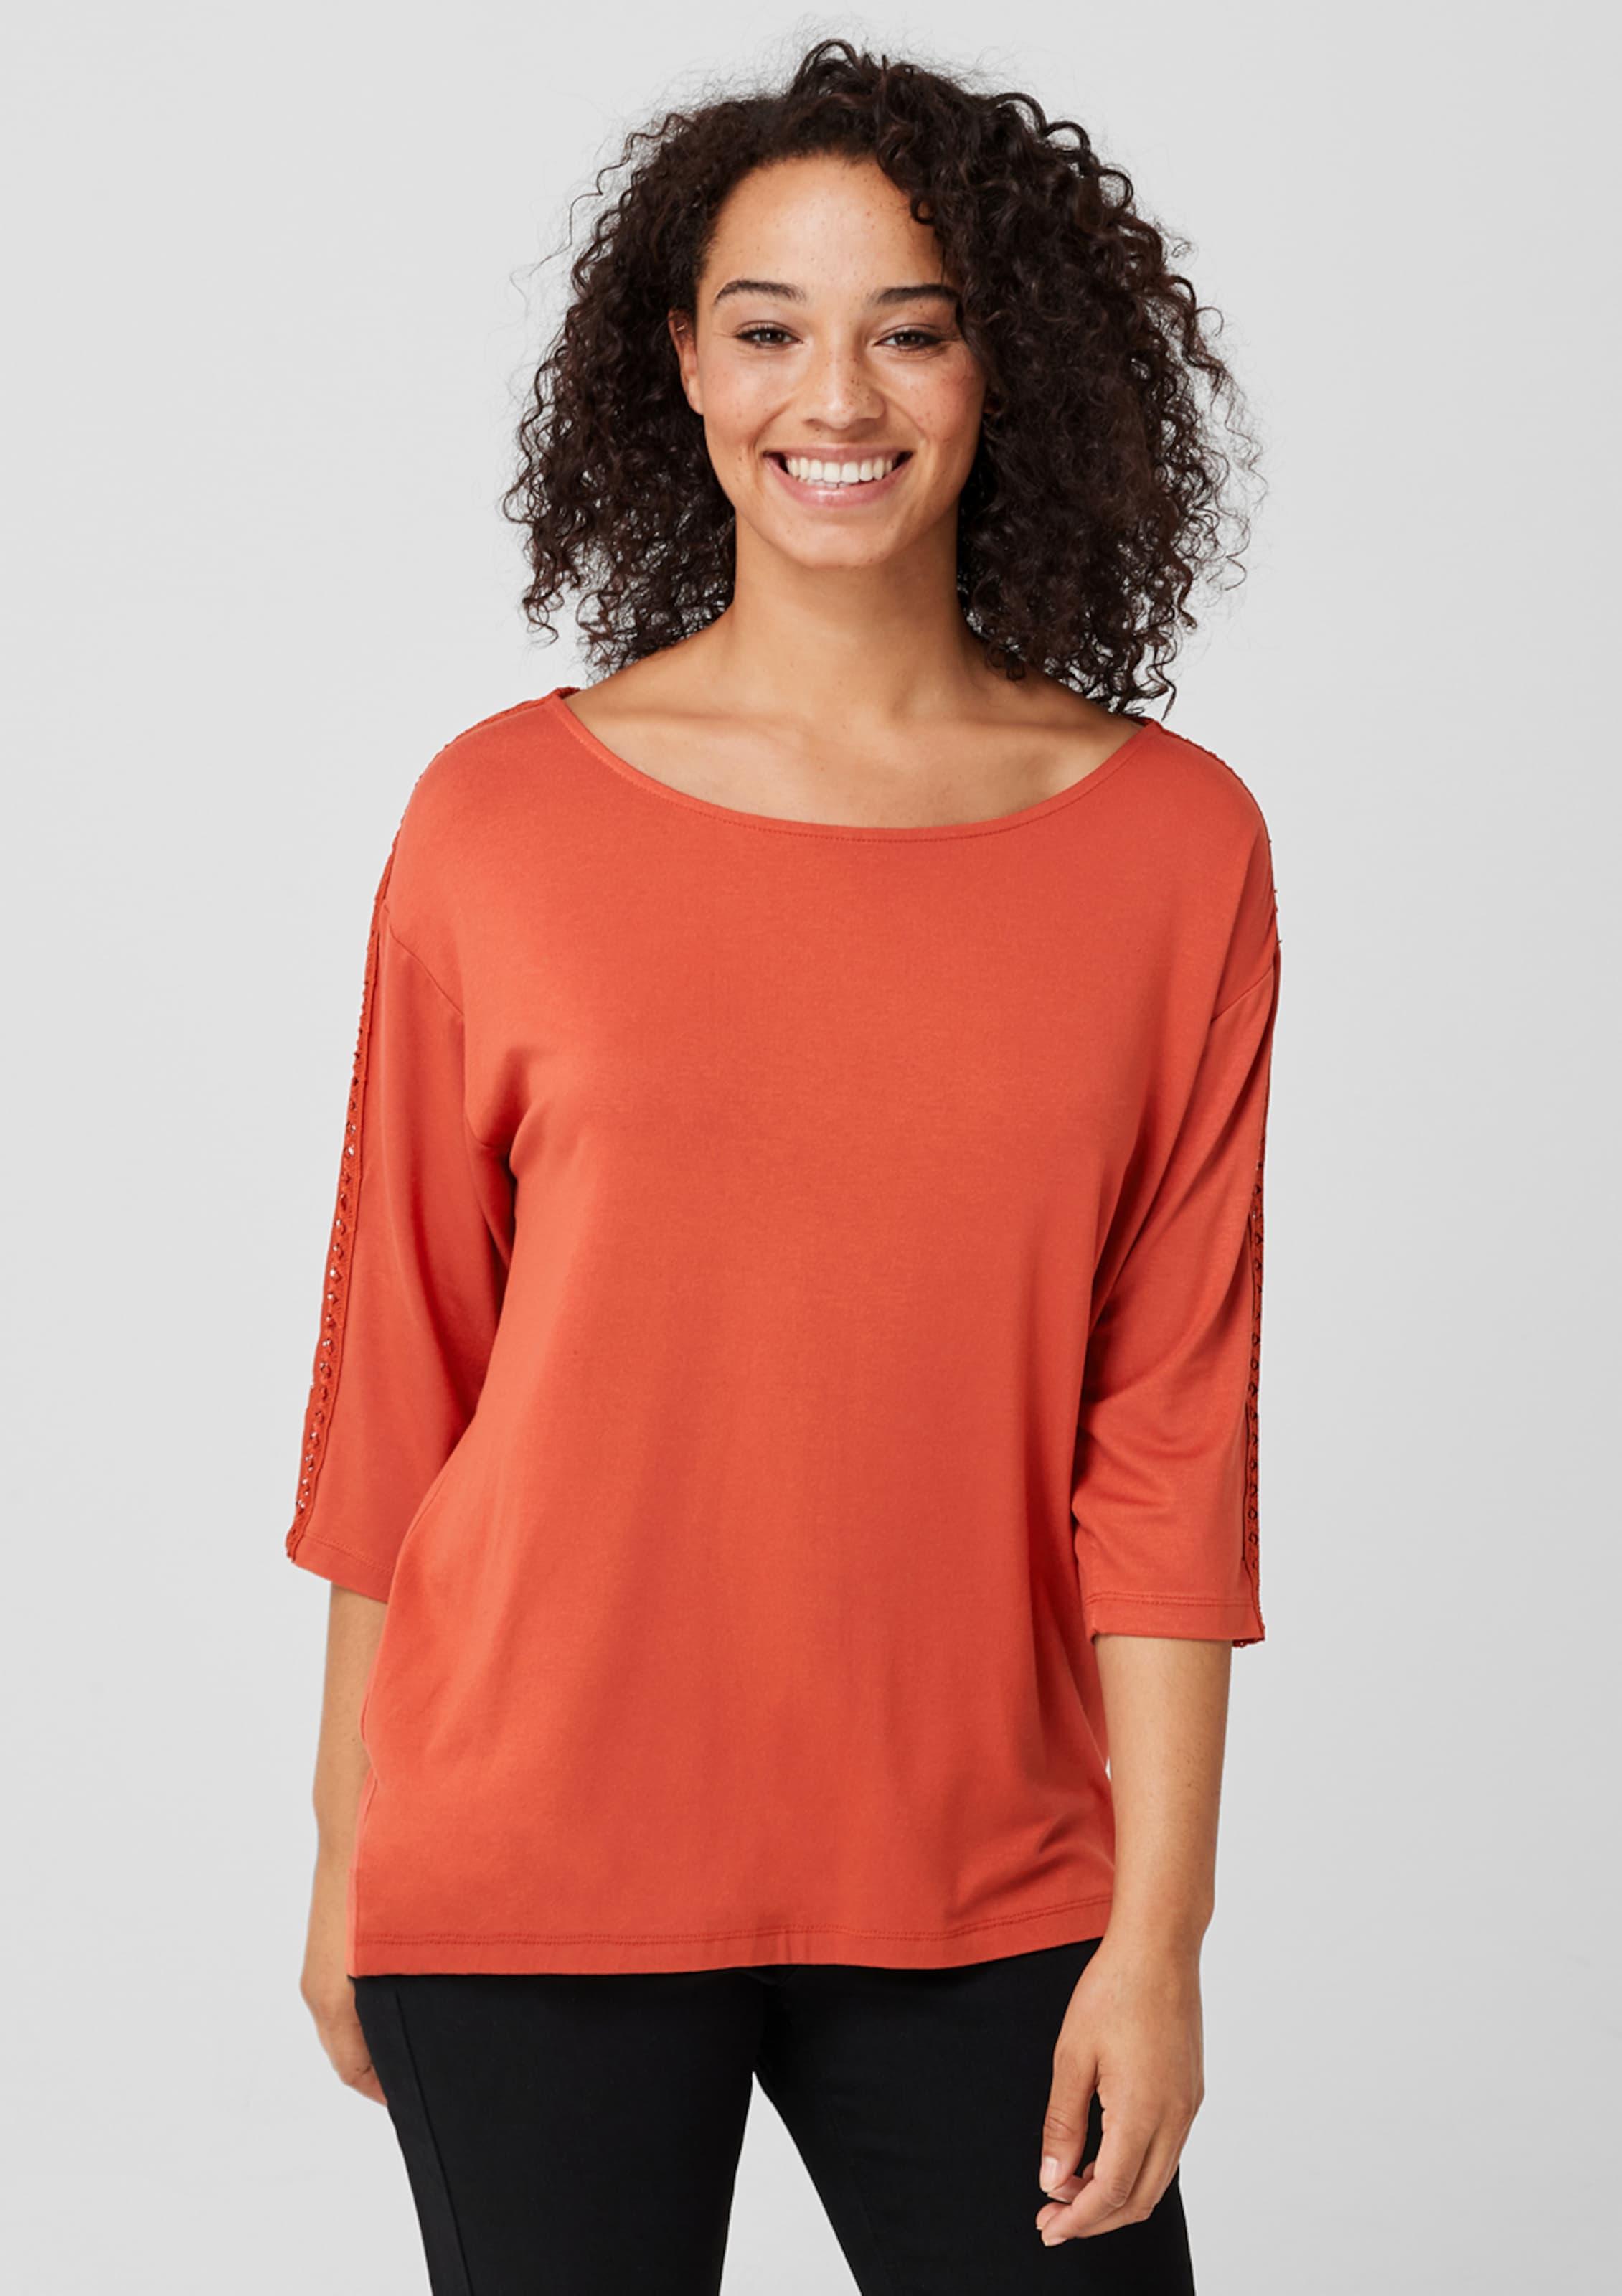 Triangle Jerseyshirt Orange Orange Triangle Jerseyshirt In Triangle In Triangle Jerseyshirt In Orange Jerseyshirt 4RLAj5